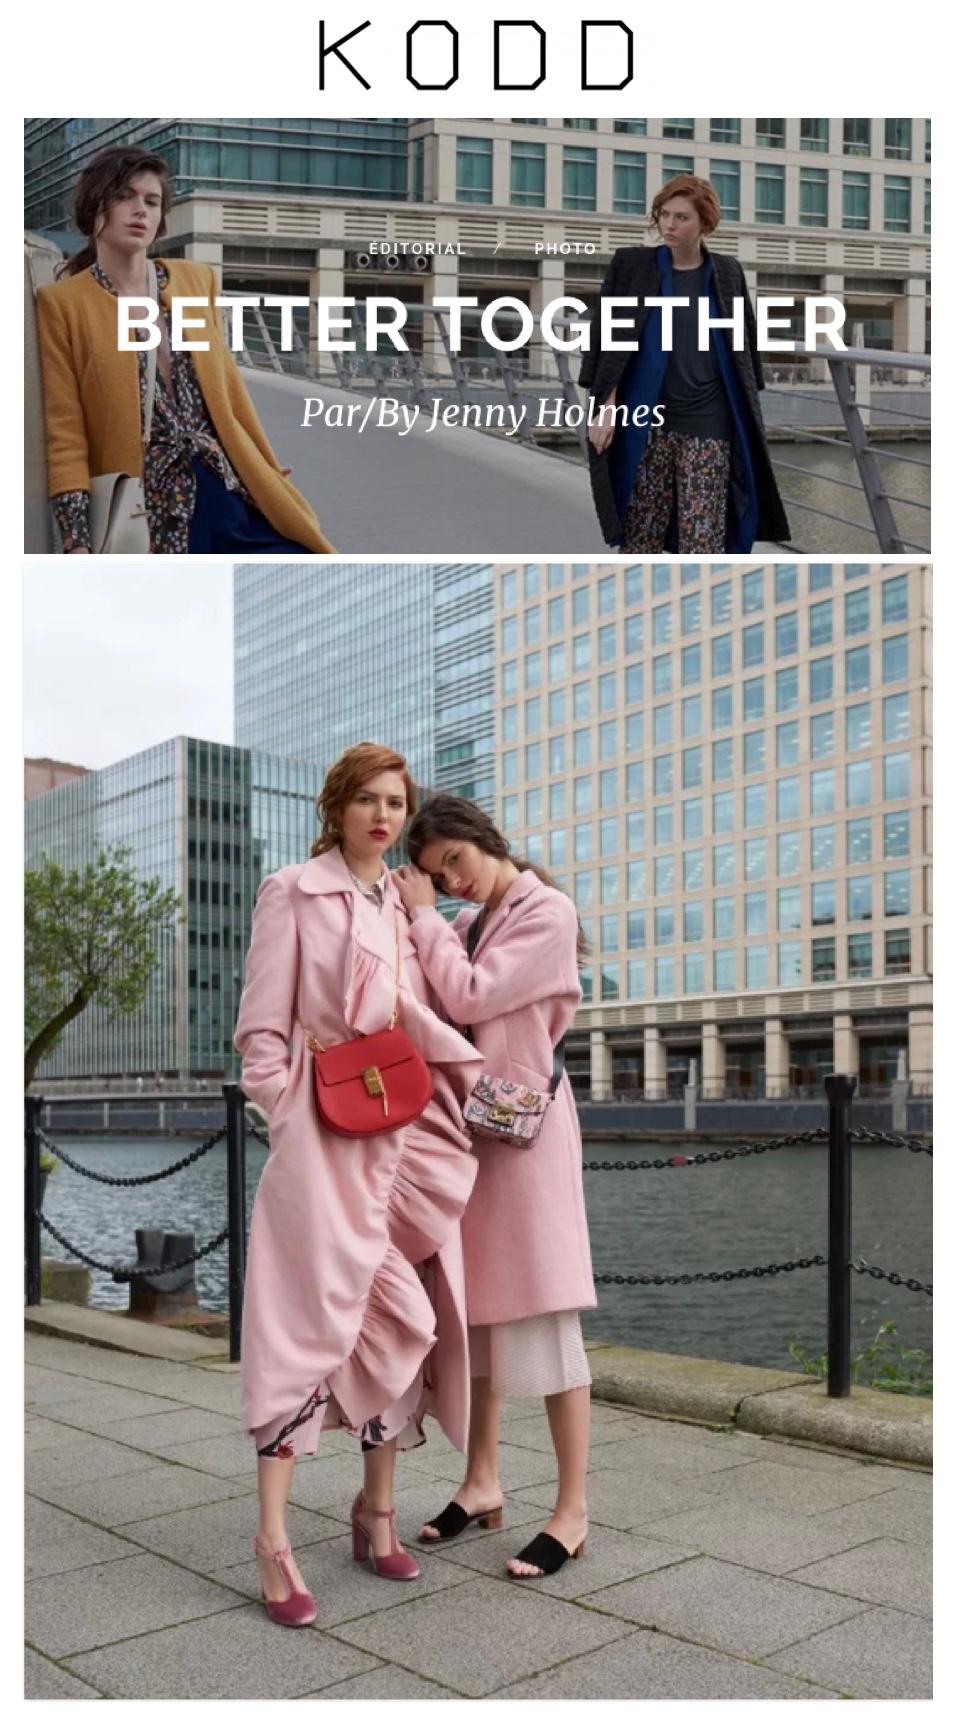 04.01.18 KODD Magazine Online 04.jpg